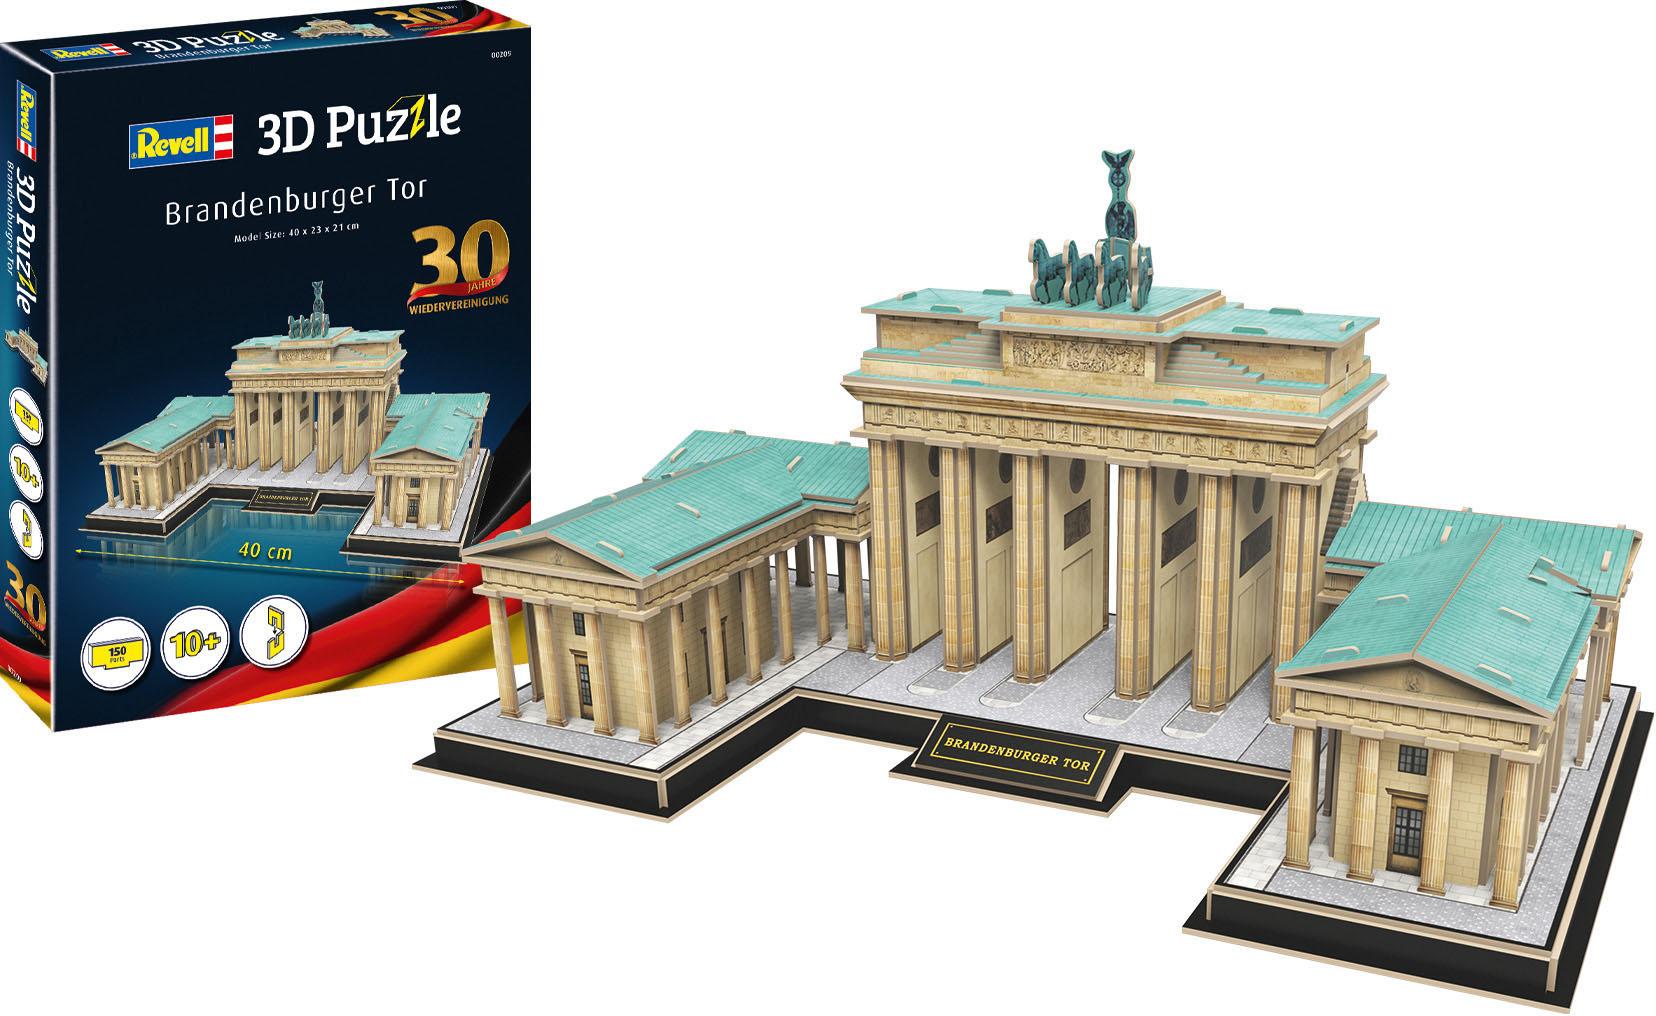 Revell 3D-Puzzle Brandenburger Tor braun Kinder 3D Puzzle Gesellschaftsspiele